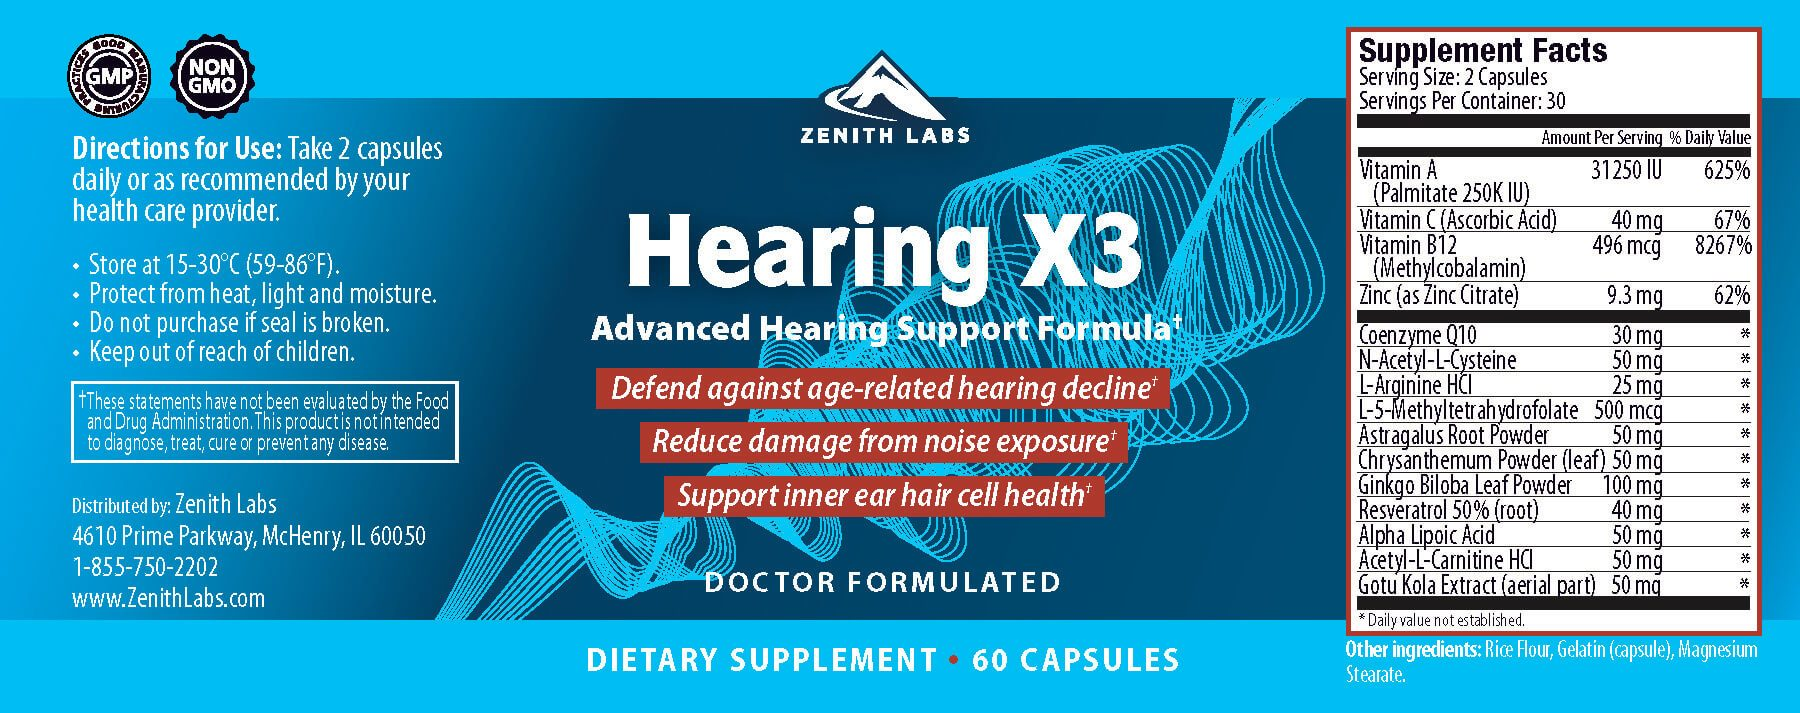 Hearing-X3-Ingredients-Label